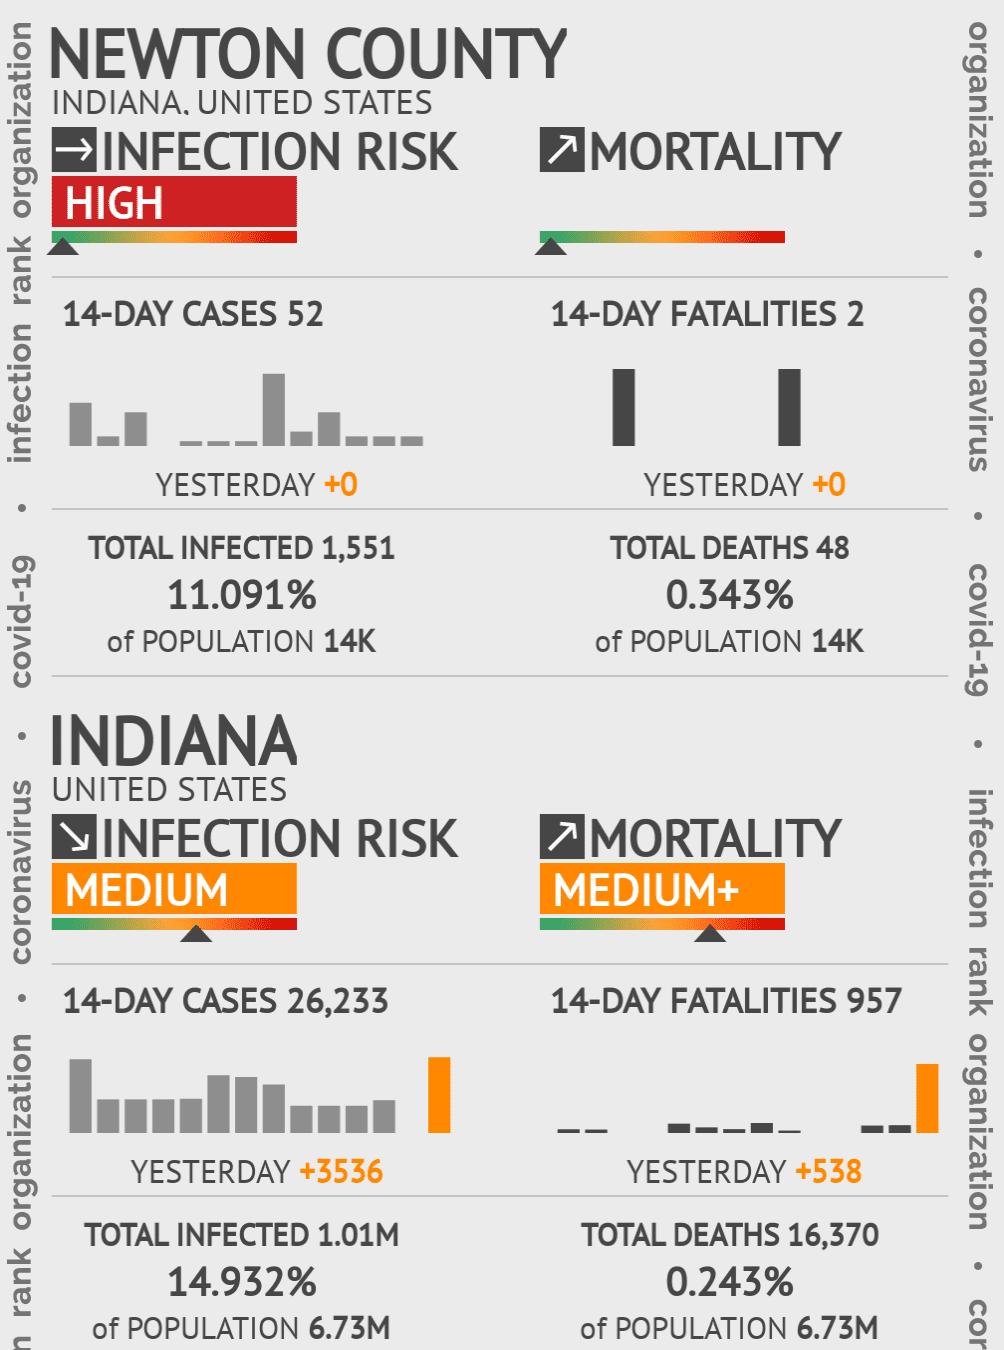 Newton County Coronavirus Covid-19 Risk of Infection on February 26, 2021